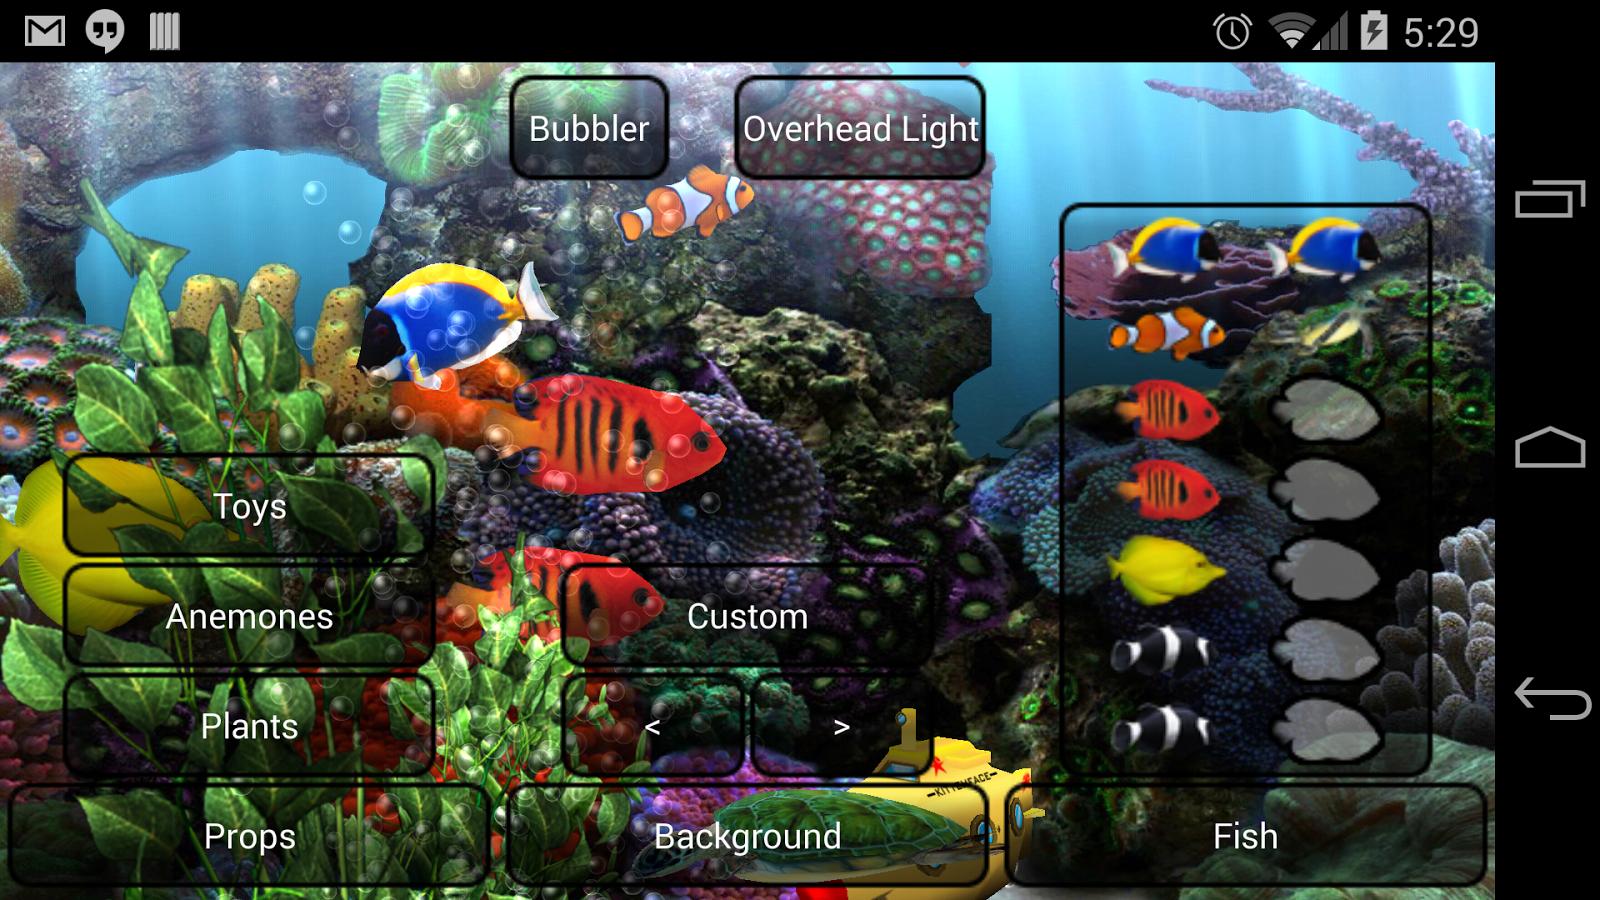 Aquarium Live Wallpaper   Android Apps on Google Play 1600x900